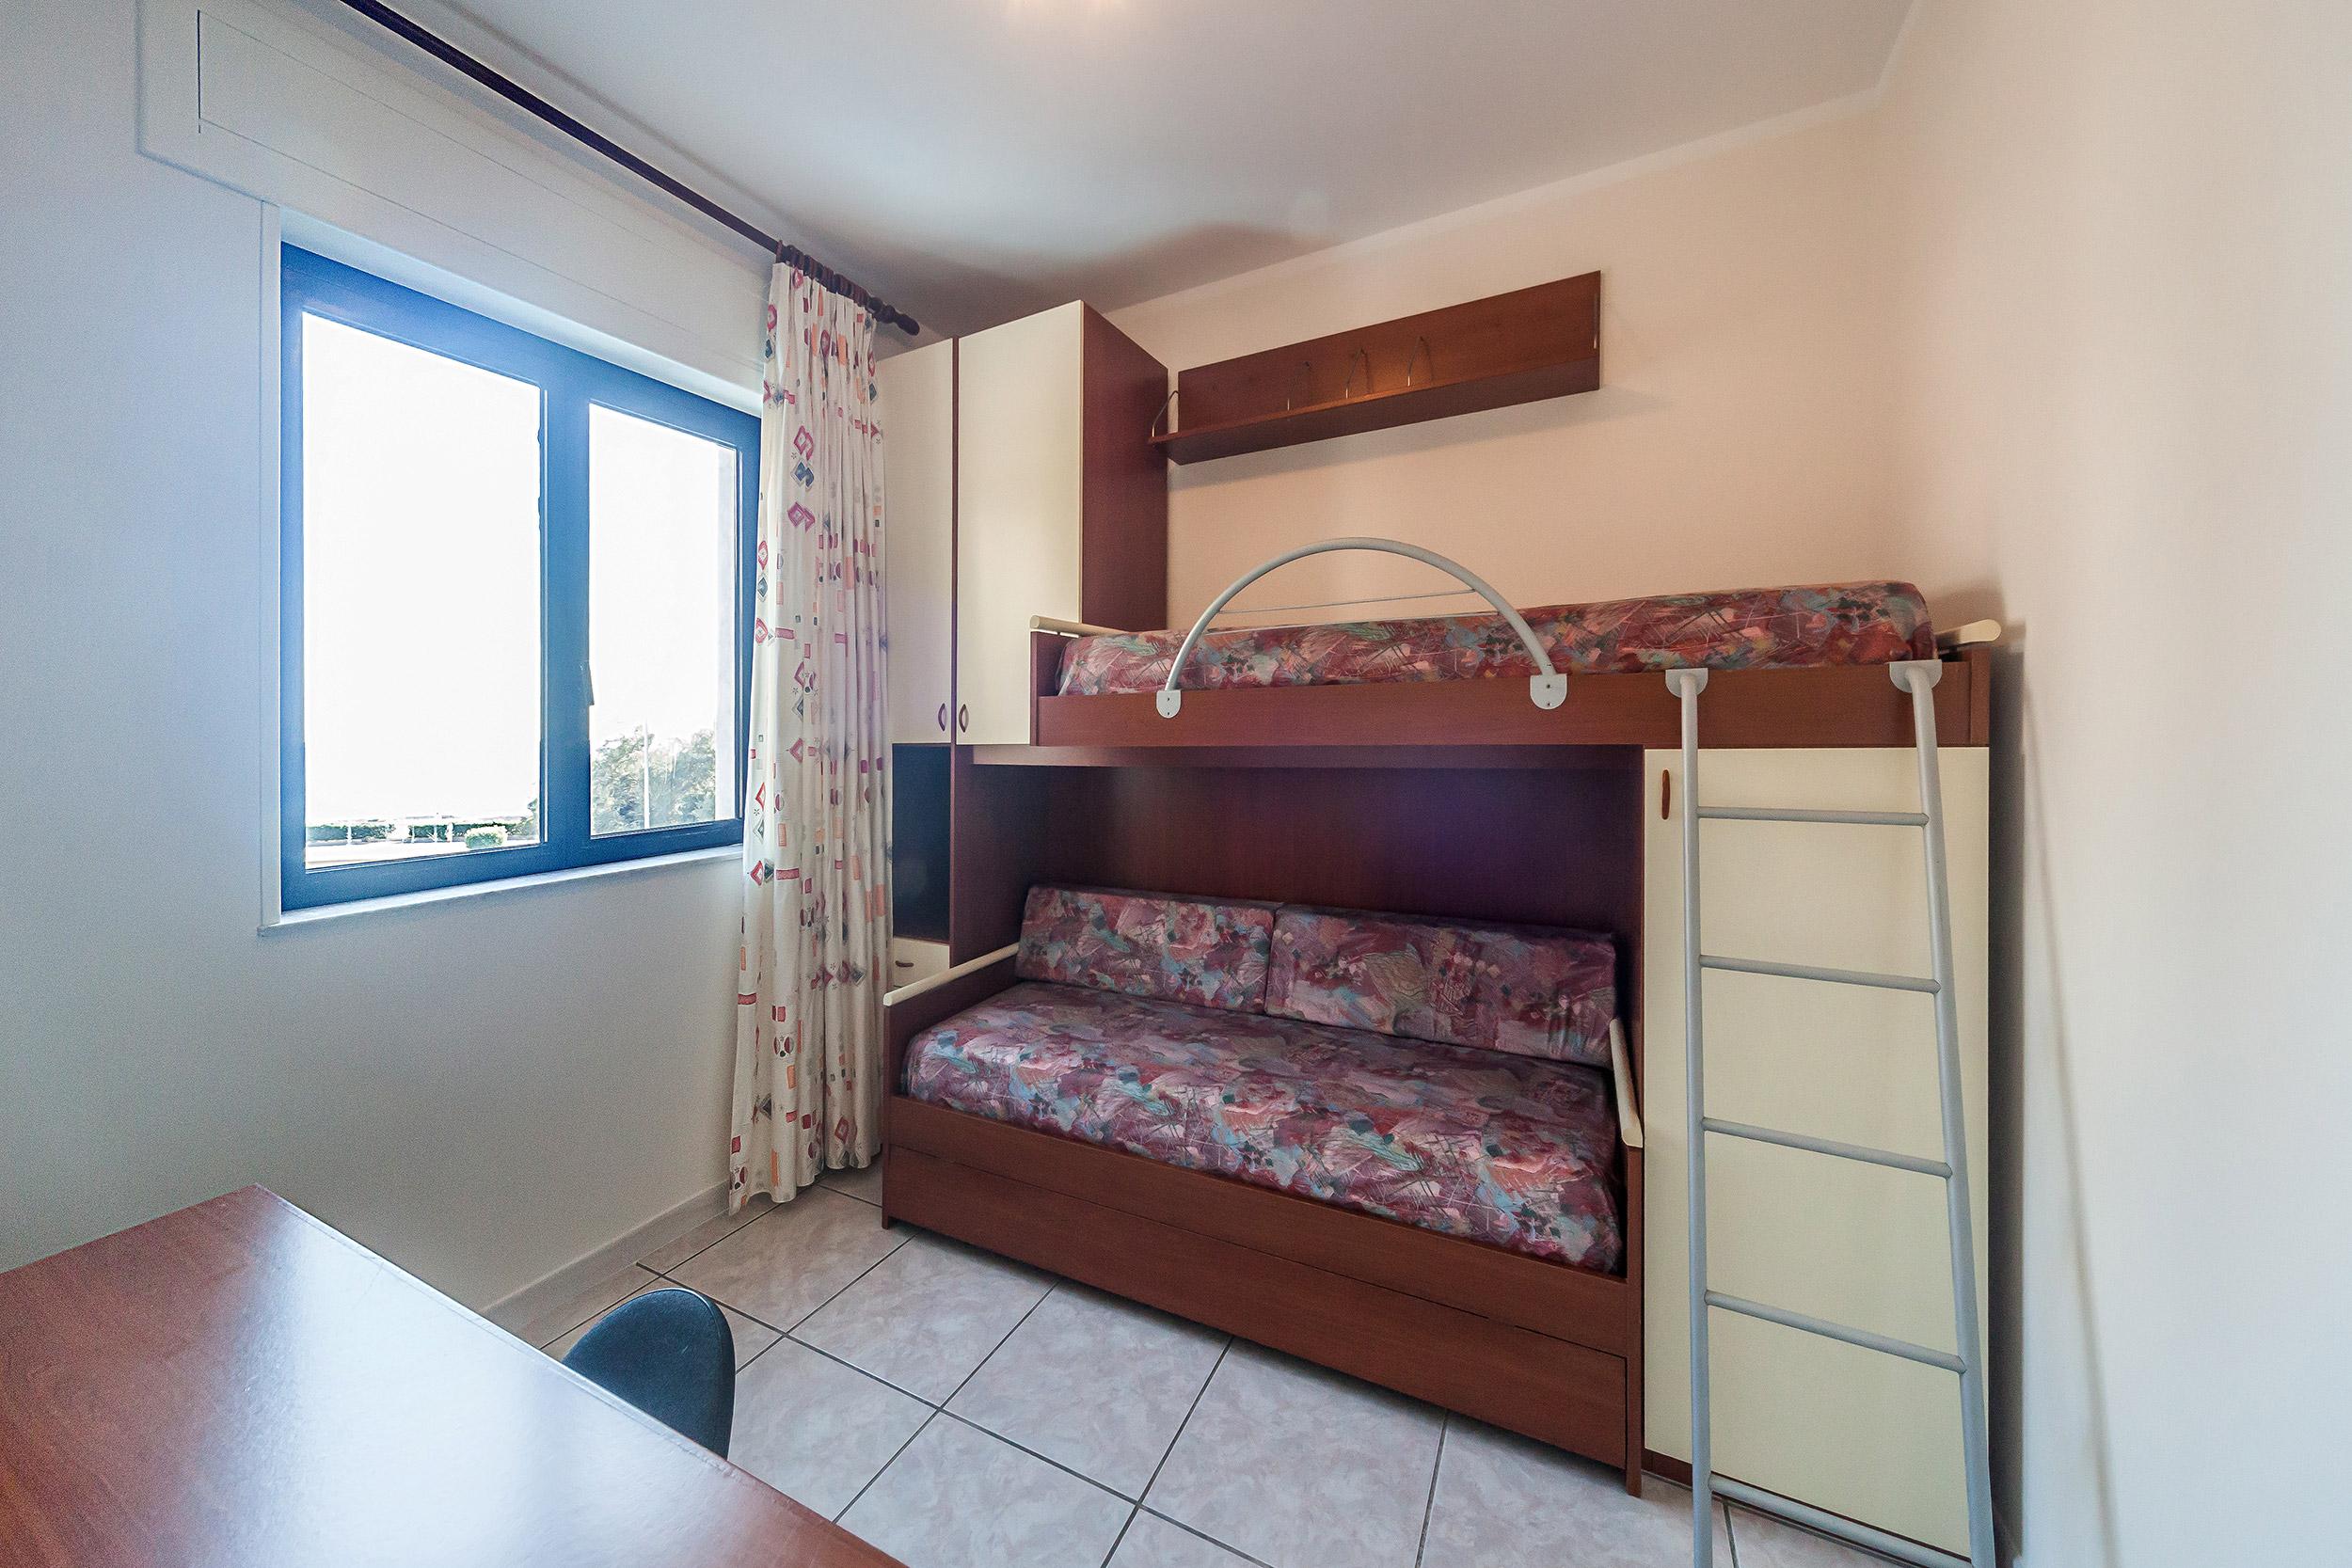 Ferienwohnung Appartamento vista mare a Gallipoli 4/6 posti - Baia Blu Side (2574458), Gallipoli, Lecce, Apulien, Italien, Bild 15